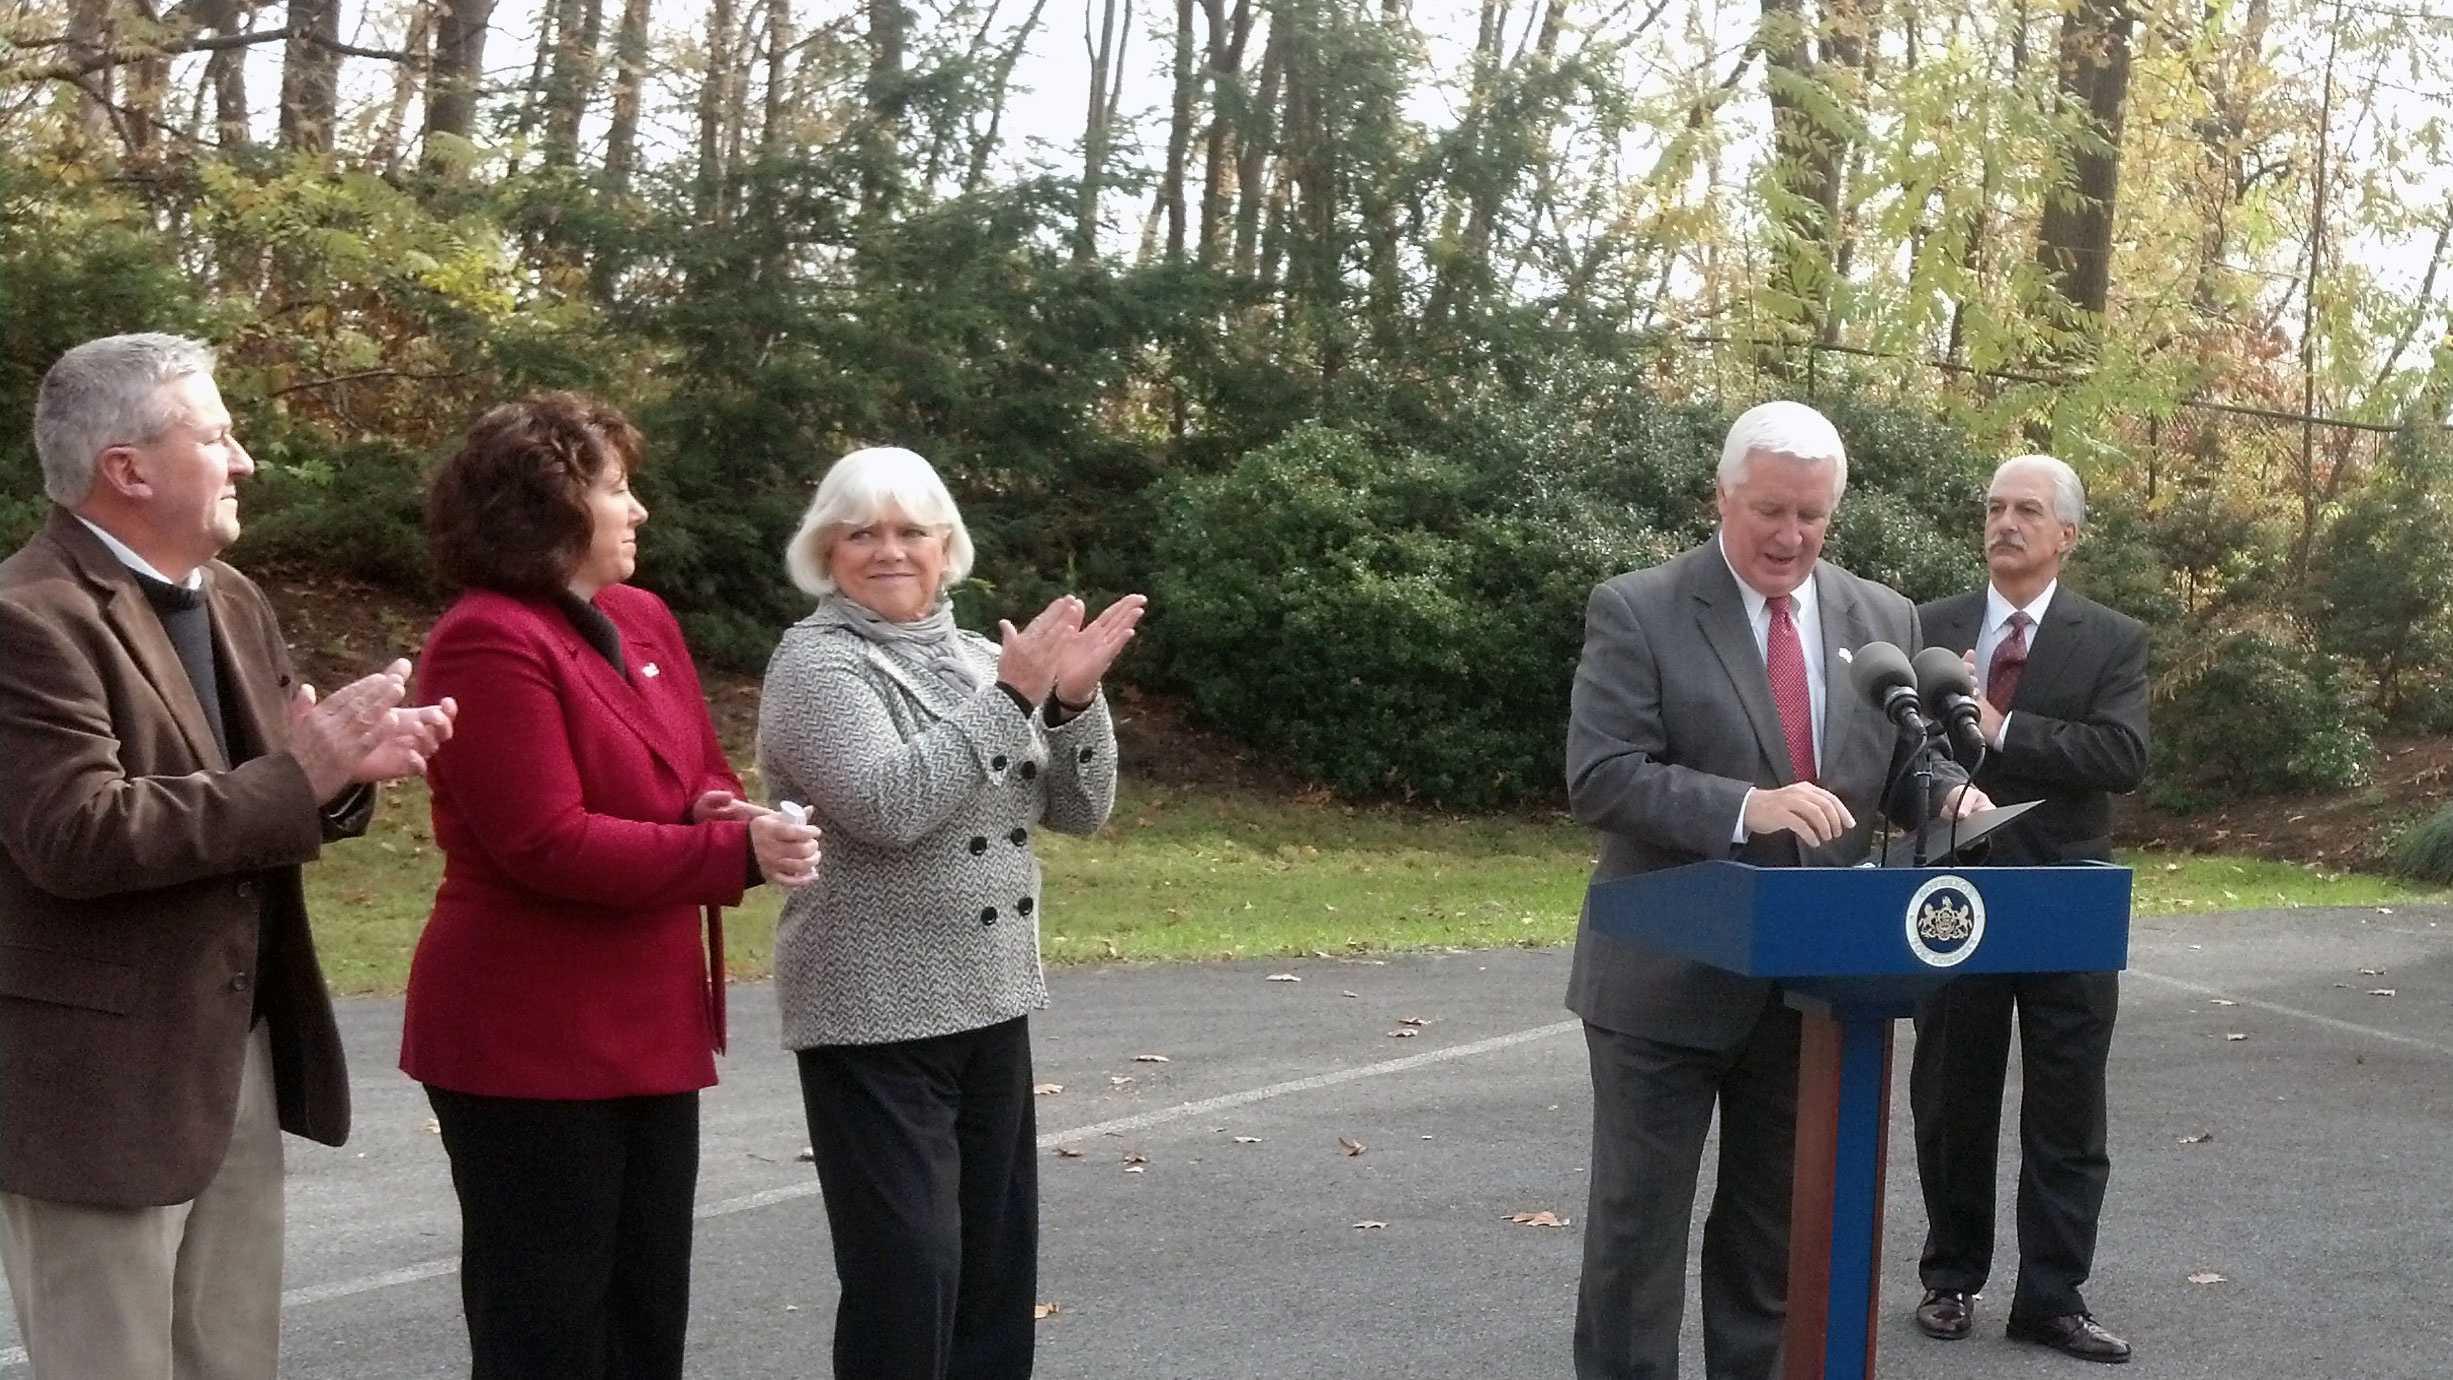 Gov. Tom Corbett announces funding for dozens of park projects Tuesday at Coleman Memorial Park in Lebanon.